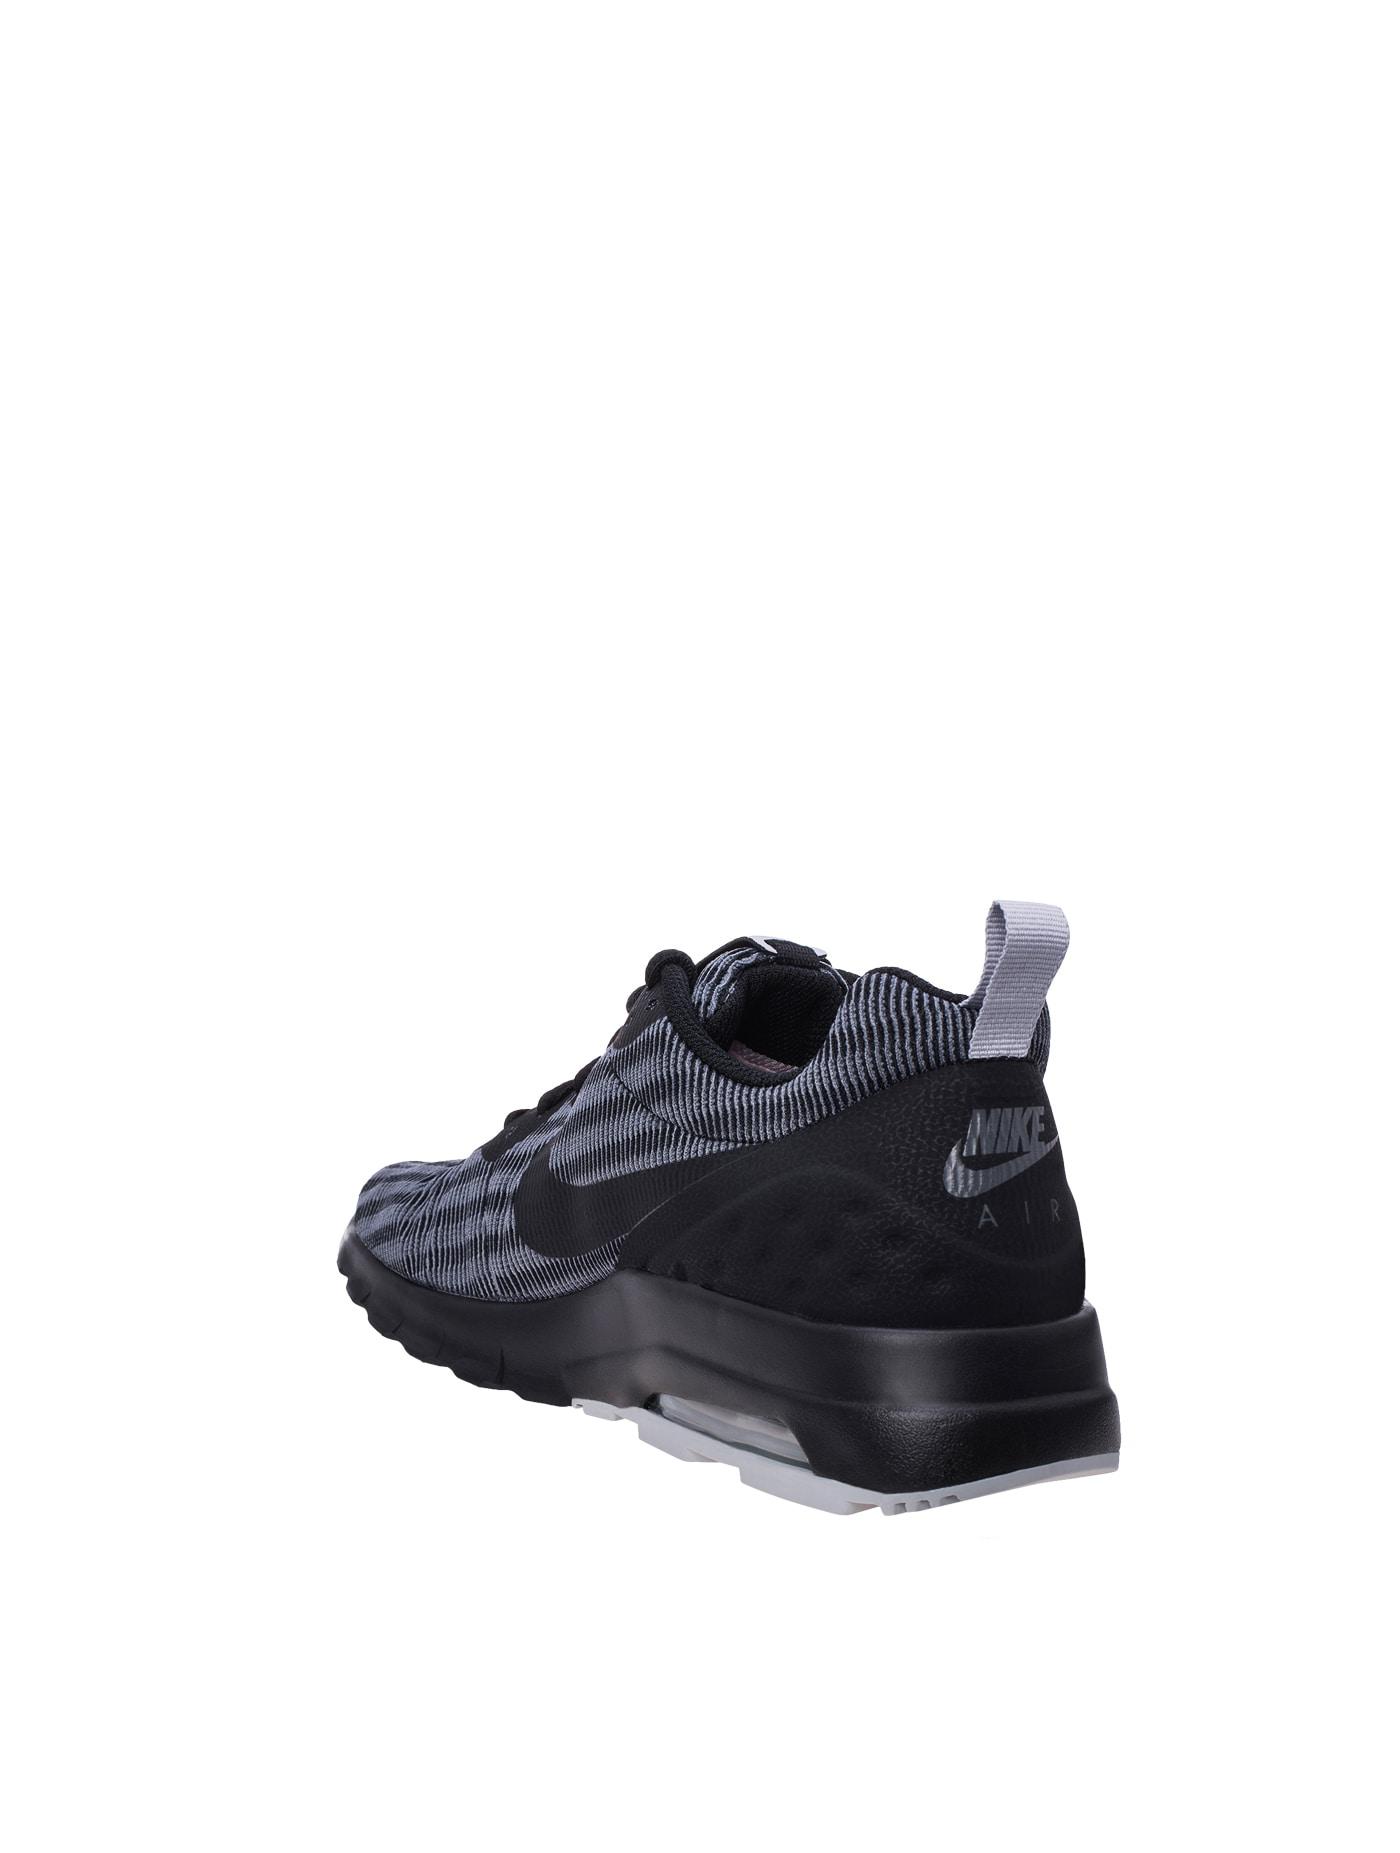 Nike Air Max Motion LW se cortos señora zapatos casual